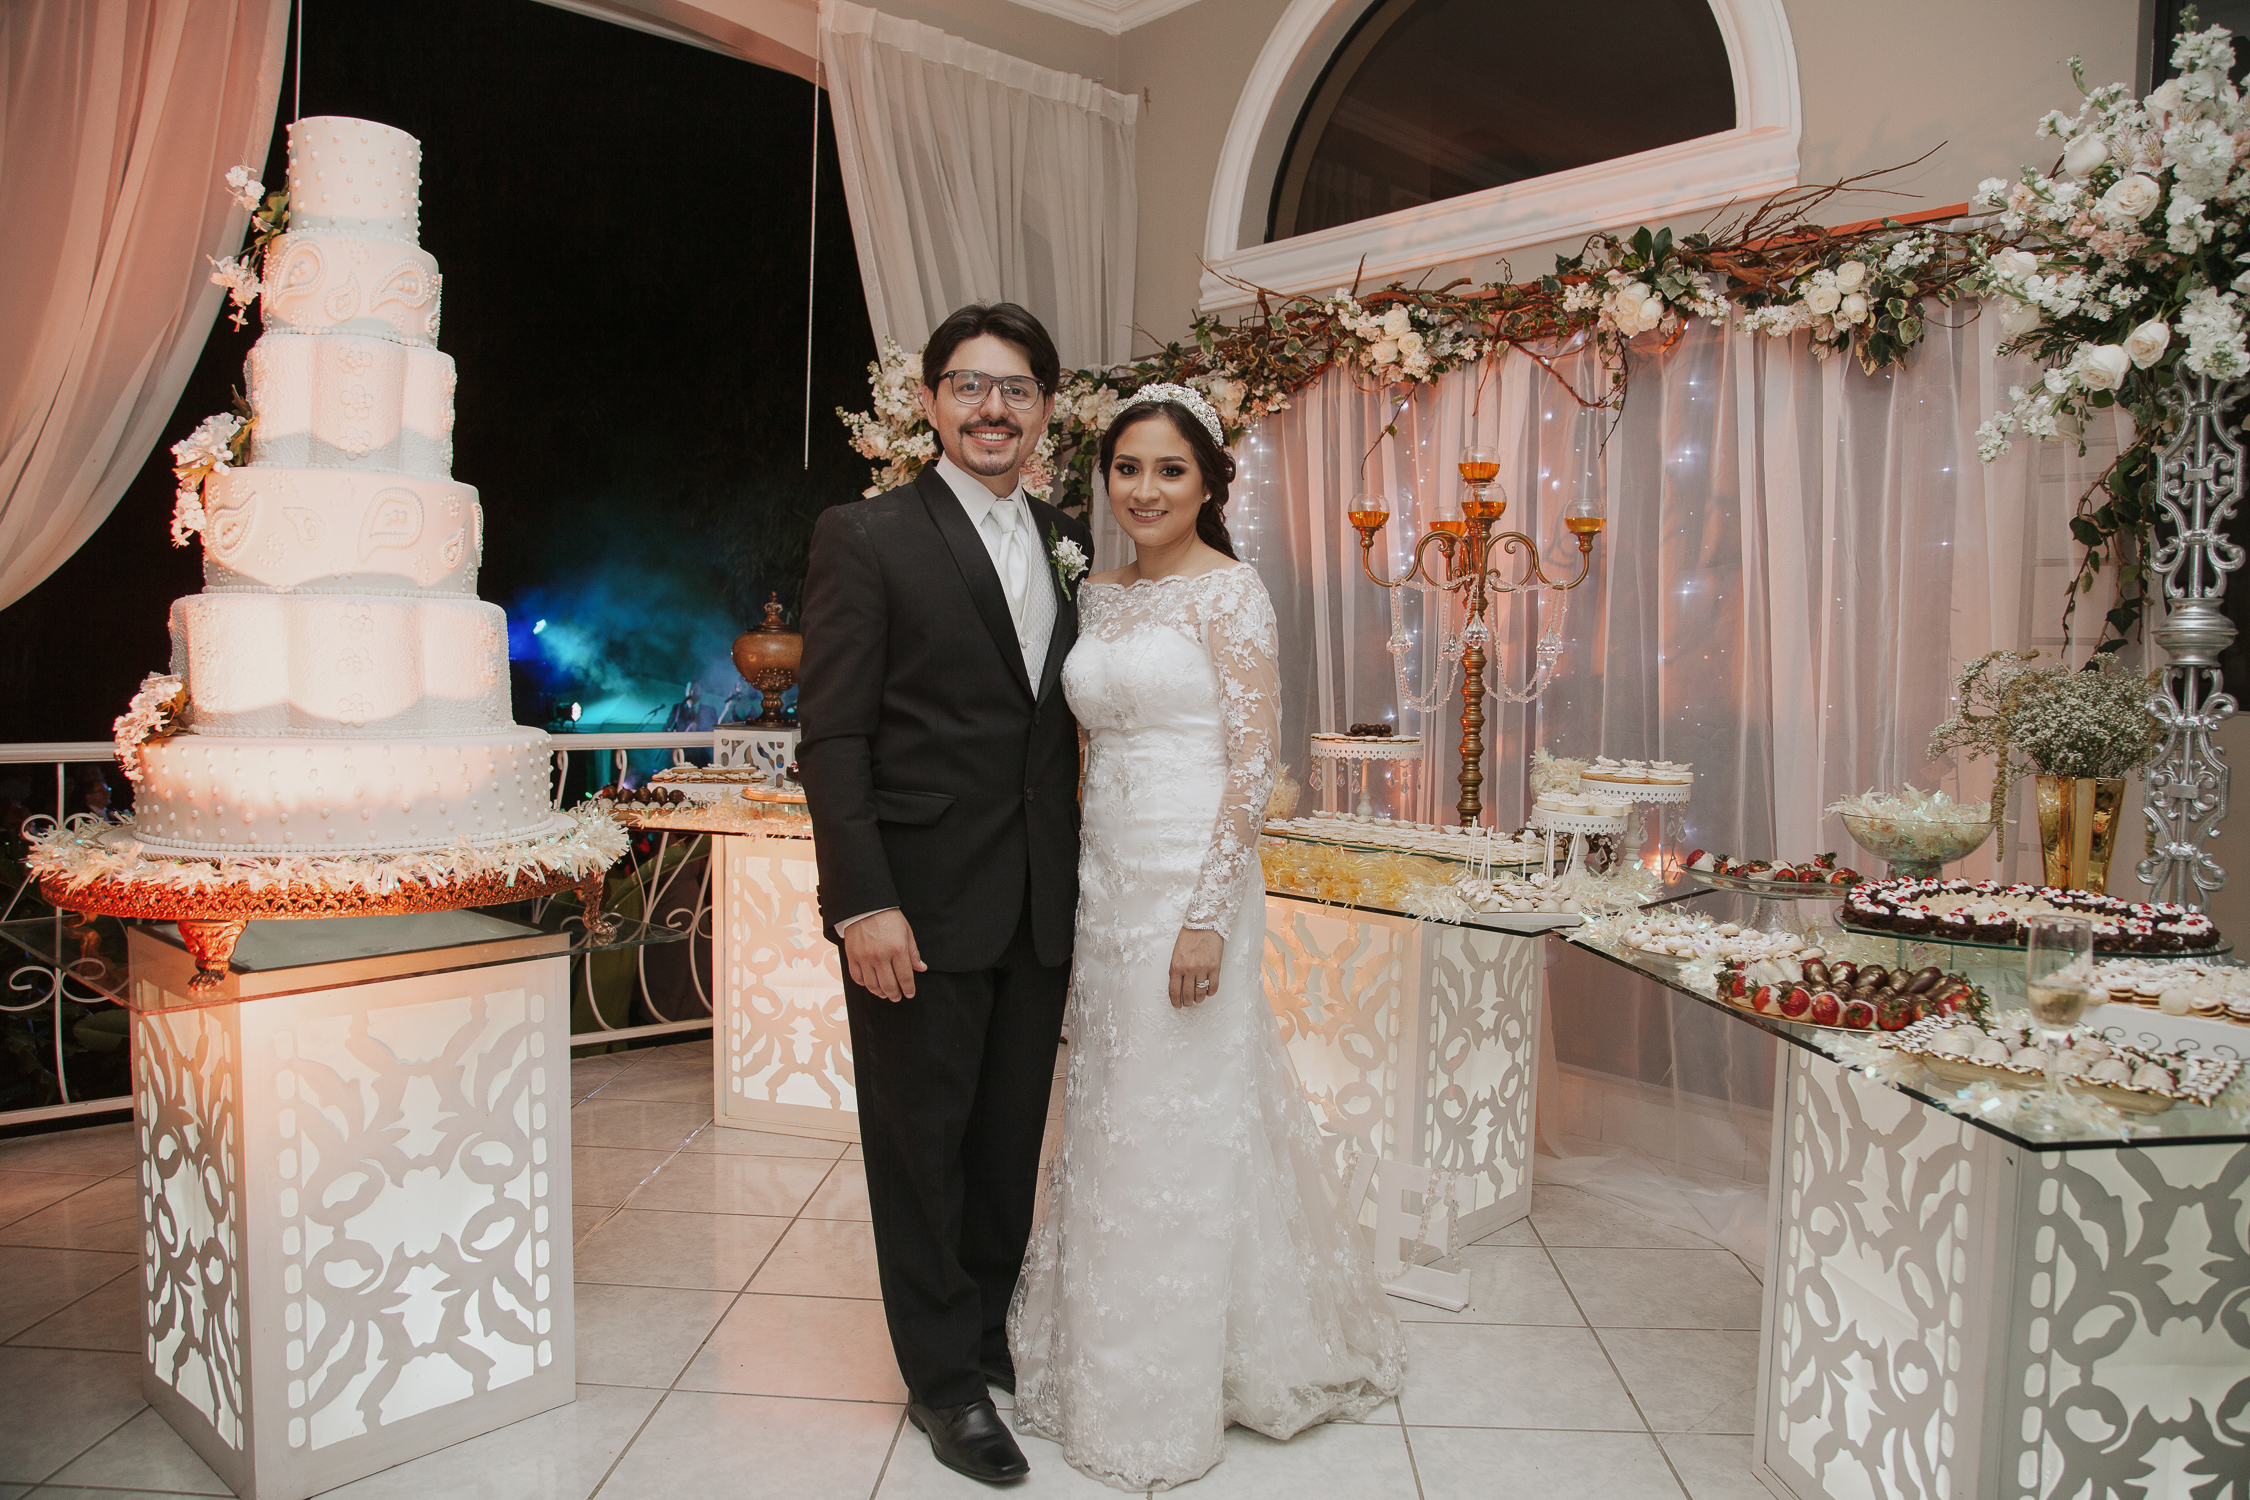 Michelle-Agurto-Fotografia-Bodas-Ecuador-Destination-Wedding-Photographer-Pauli-Edwin-31.JPG